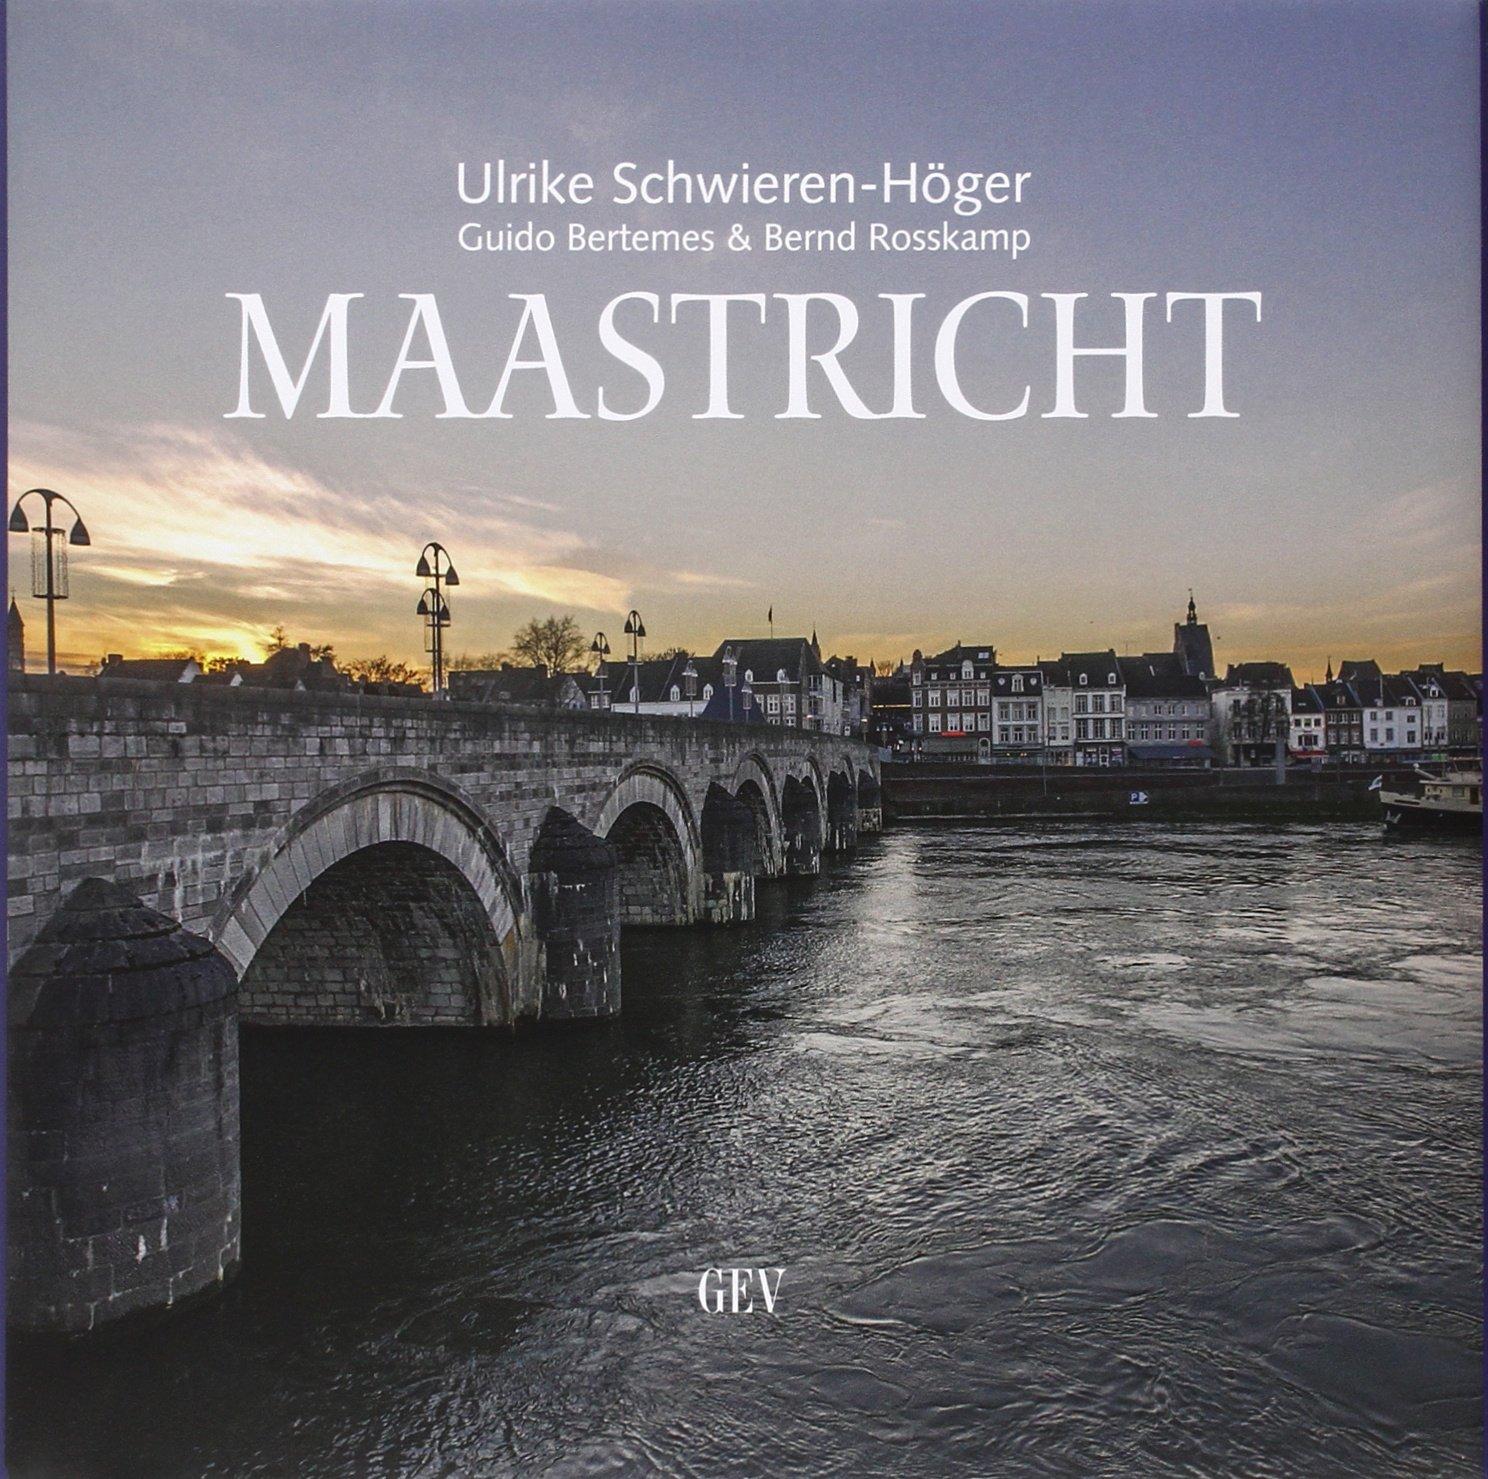 Maastricht: Bilder, Spuren, Hintergründe Gebundenes Buch – 3. Dezember 2014 Ulrike Schwieren-Höger Guido Bertemes Bernd Rosskamp Hintergründe